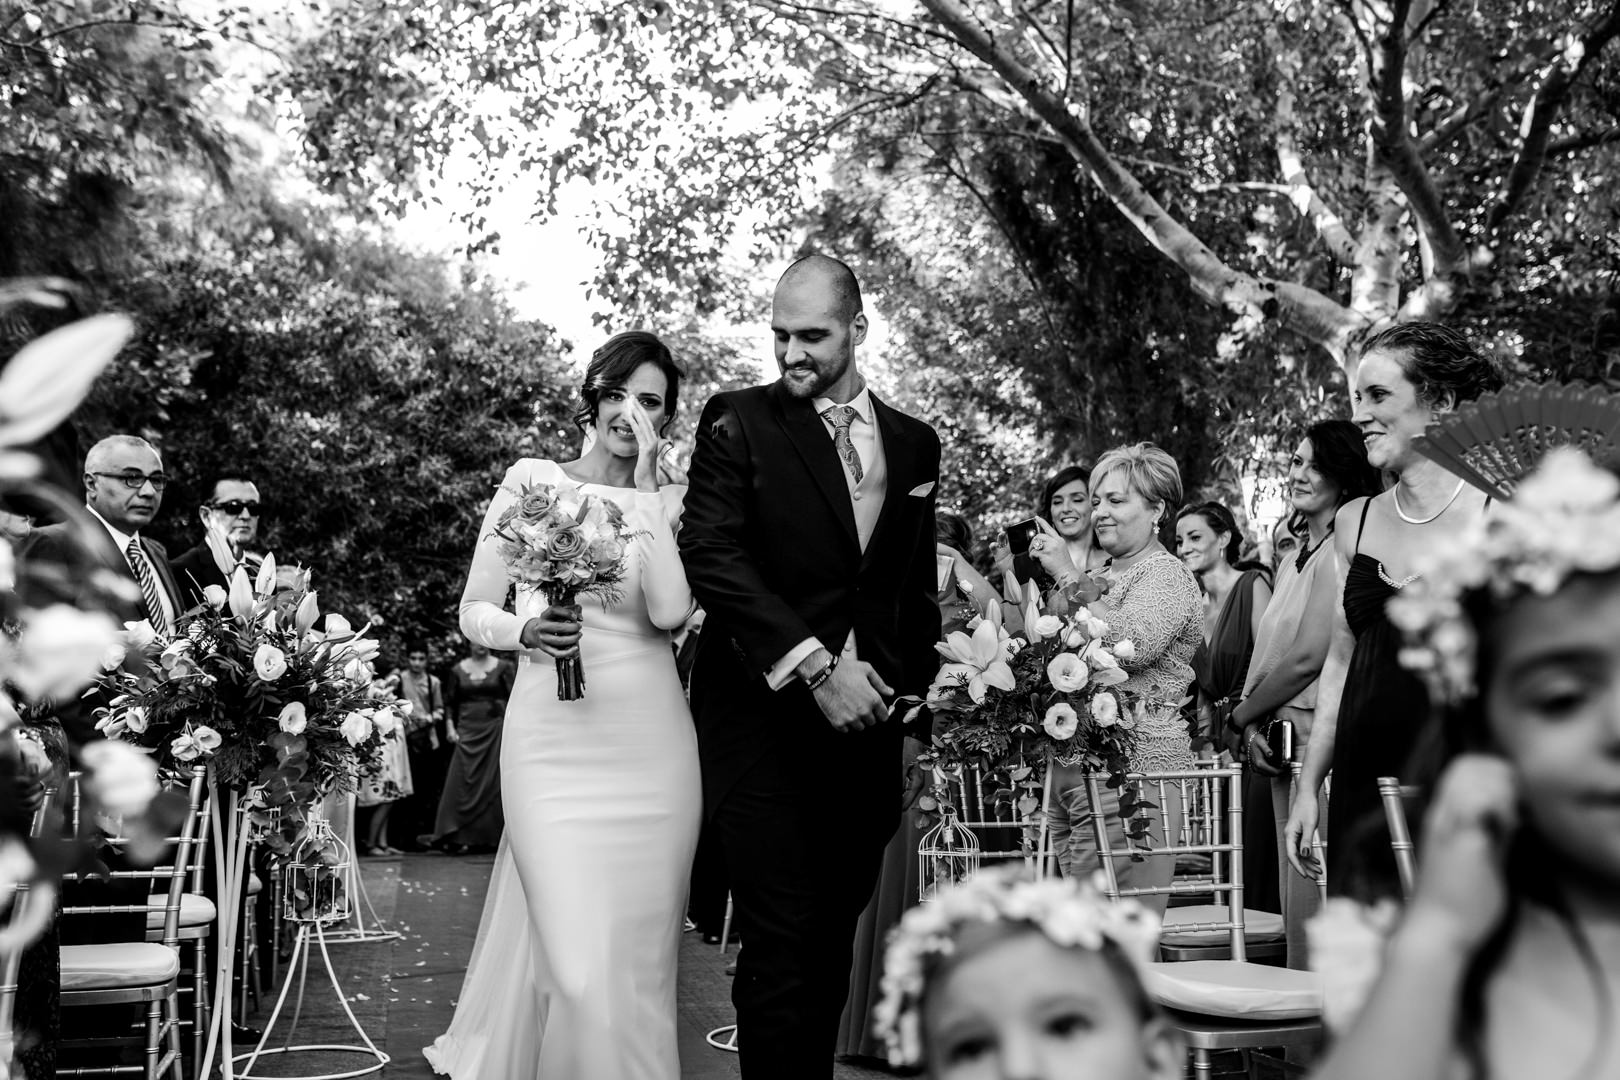 Boda-Irene-Marcos-Dos-Hermanas-Finca-Clotidle-engagement-Rafael-Torres-fotografo-bodas-sevilla-madrid-barcelona-wedding-photographer--18.jpg